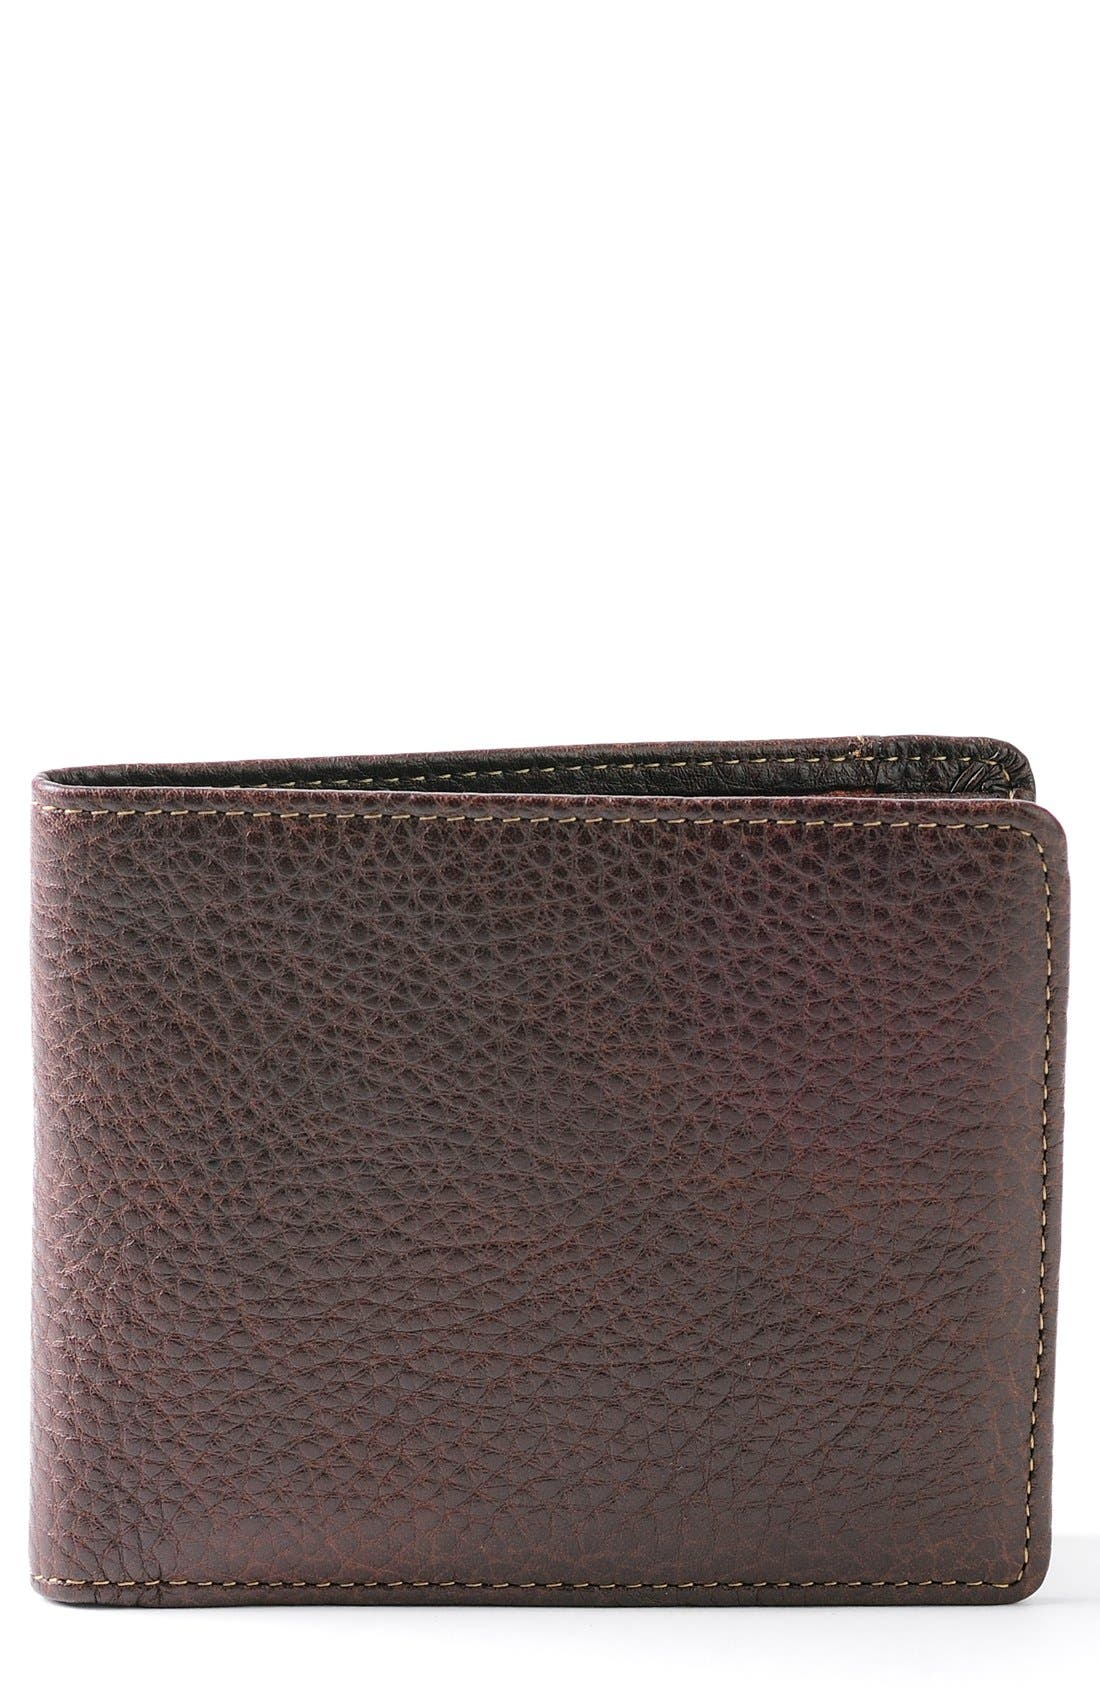 'Tyler' RFID Wallet,                         Main,                         color, COFFEE